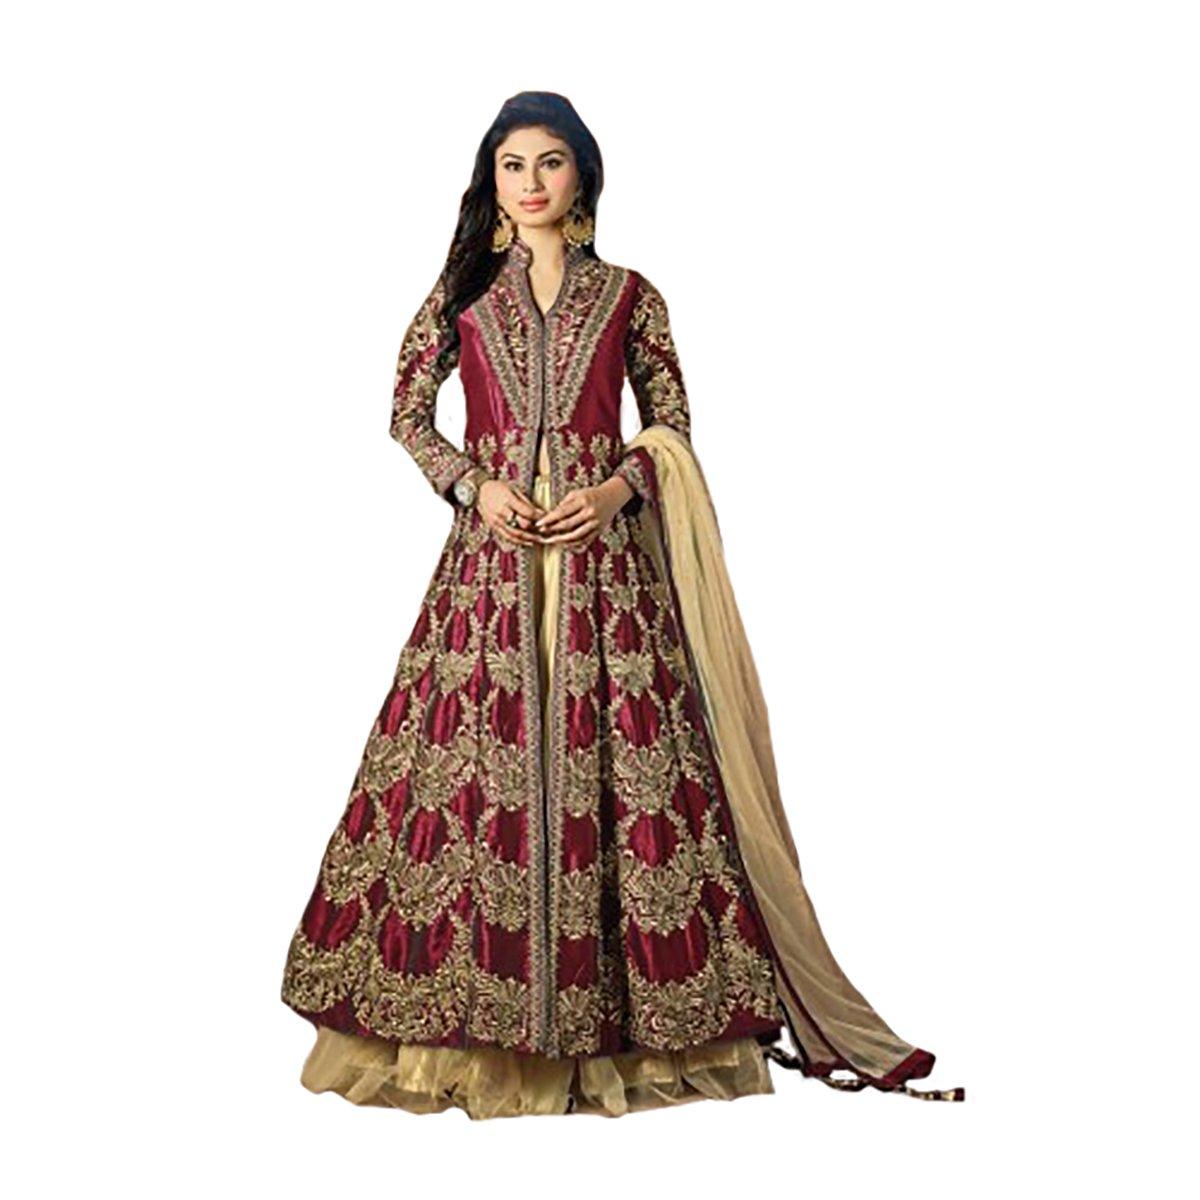 Maroon Muslim Silk Handwork Ethnic Skirt Syle Anarkali Kaftan Wedding Salwar Kameez Suit Semi Stitched Indian Pakistani Hit